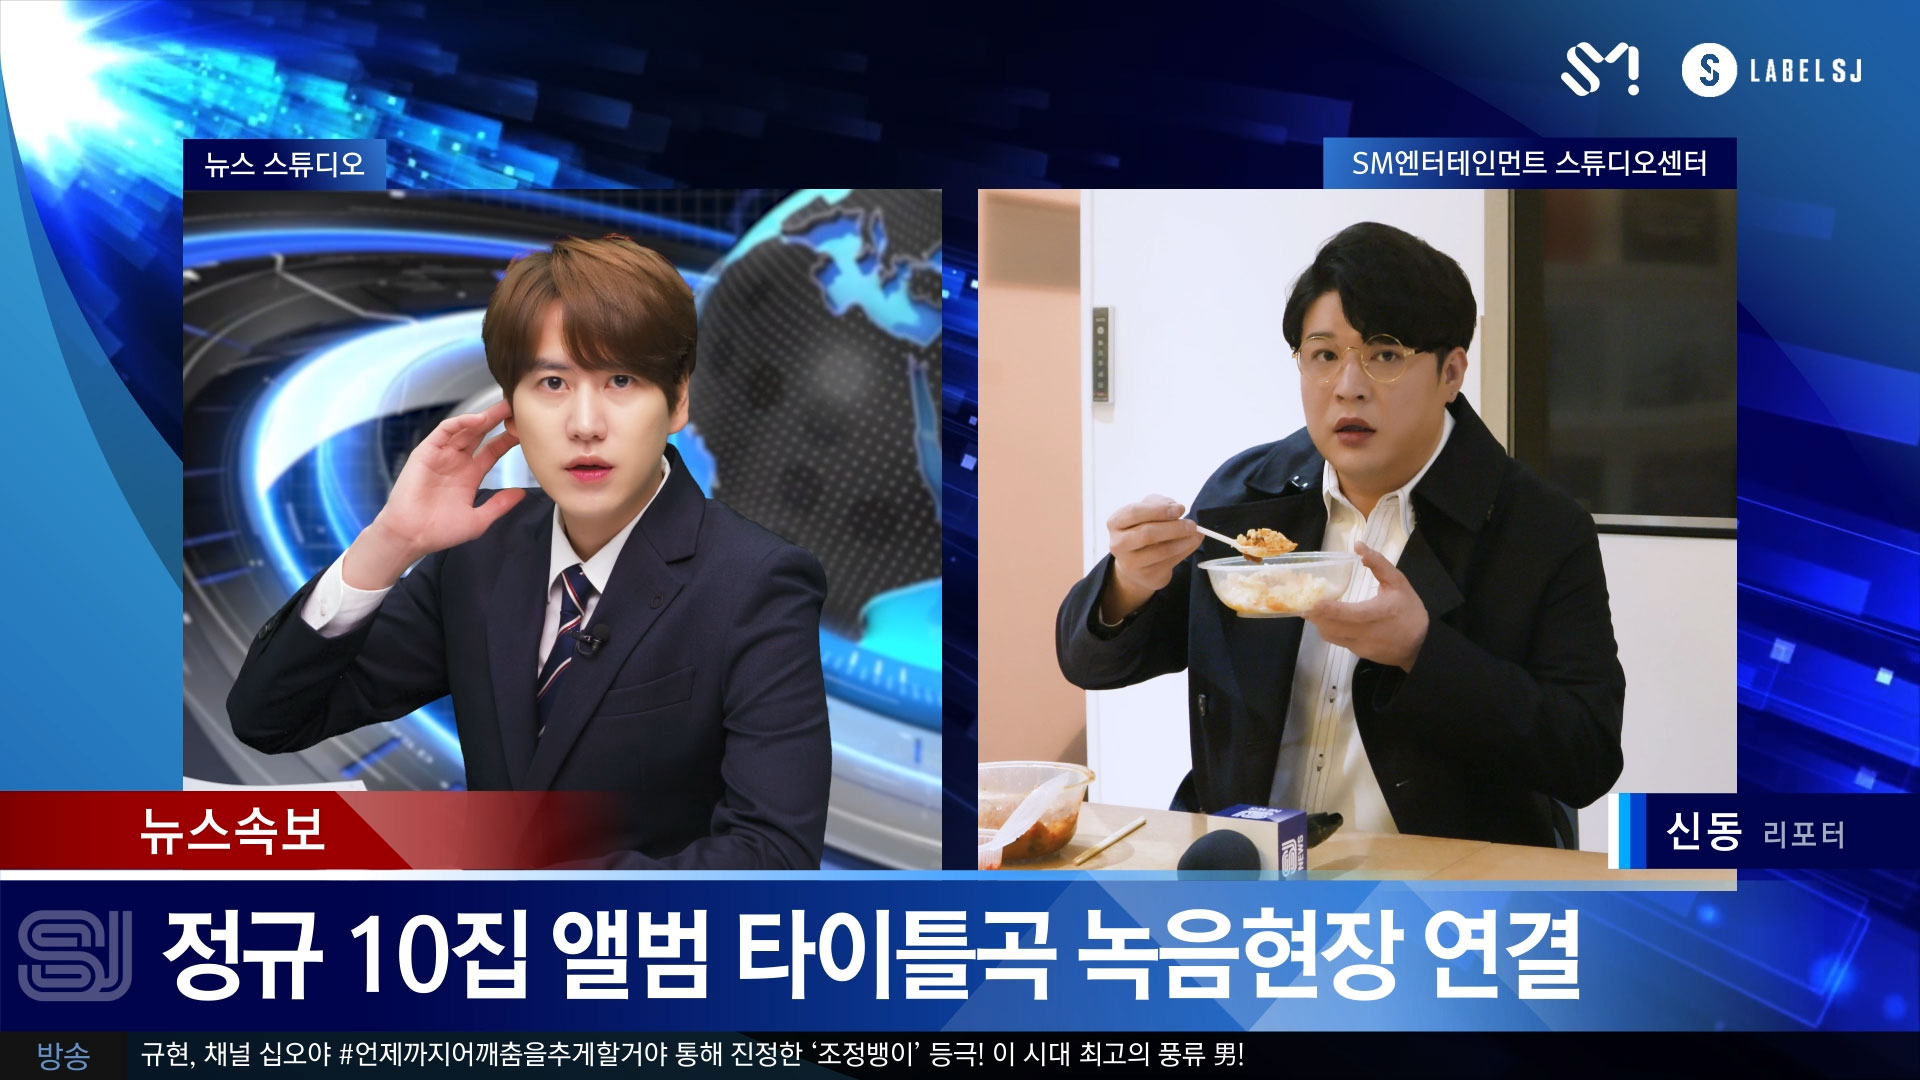 [SJ NEWS Ep.2] 슈주 뉴스 2회